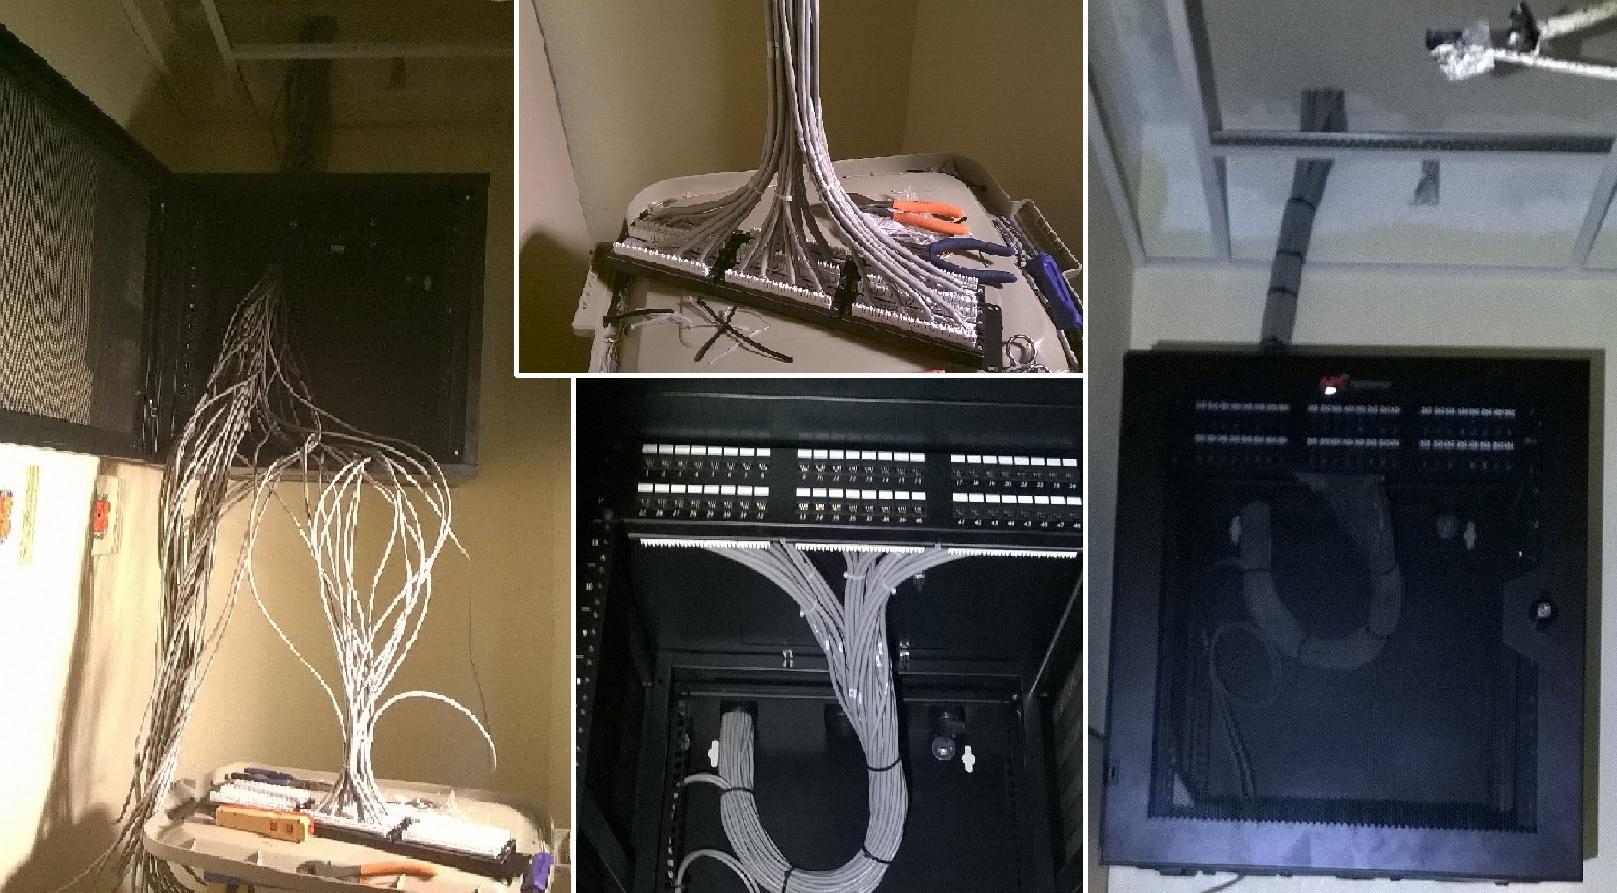 WalkerITC - Computer Repair - Network and IT Service - Texarkana image 1